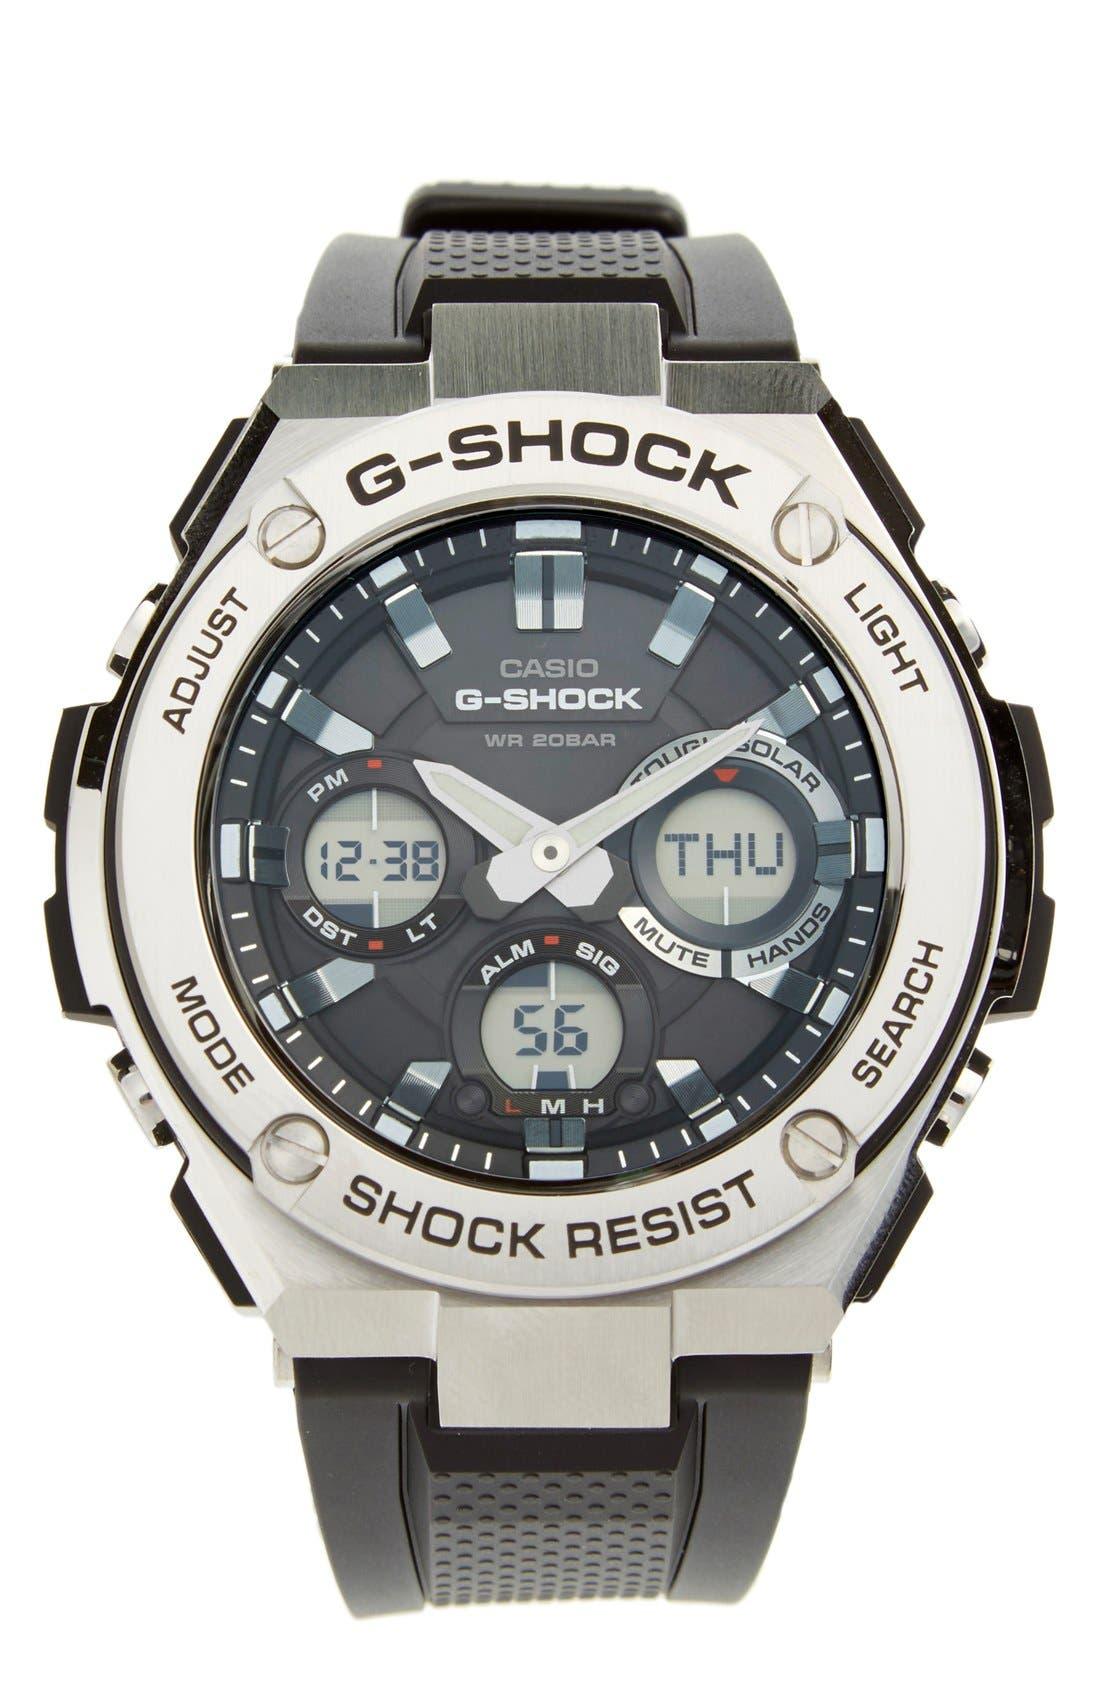 G-SHOCK BABY-G G-Shock G-Steel Ana-Digi Resin Strap Watch, 59mm x 52mm